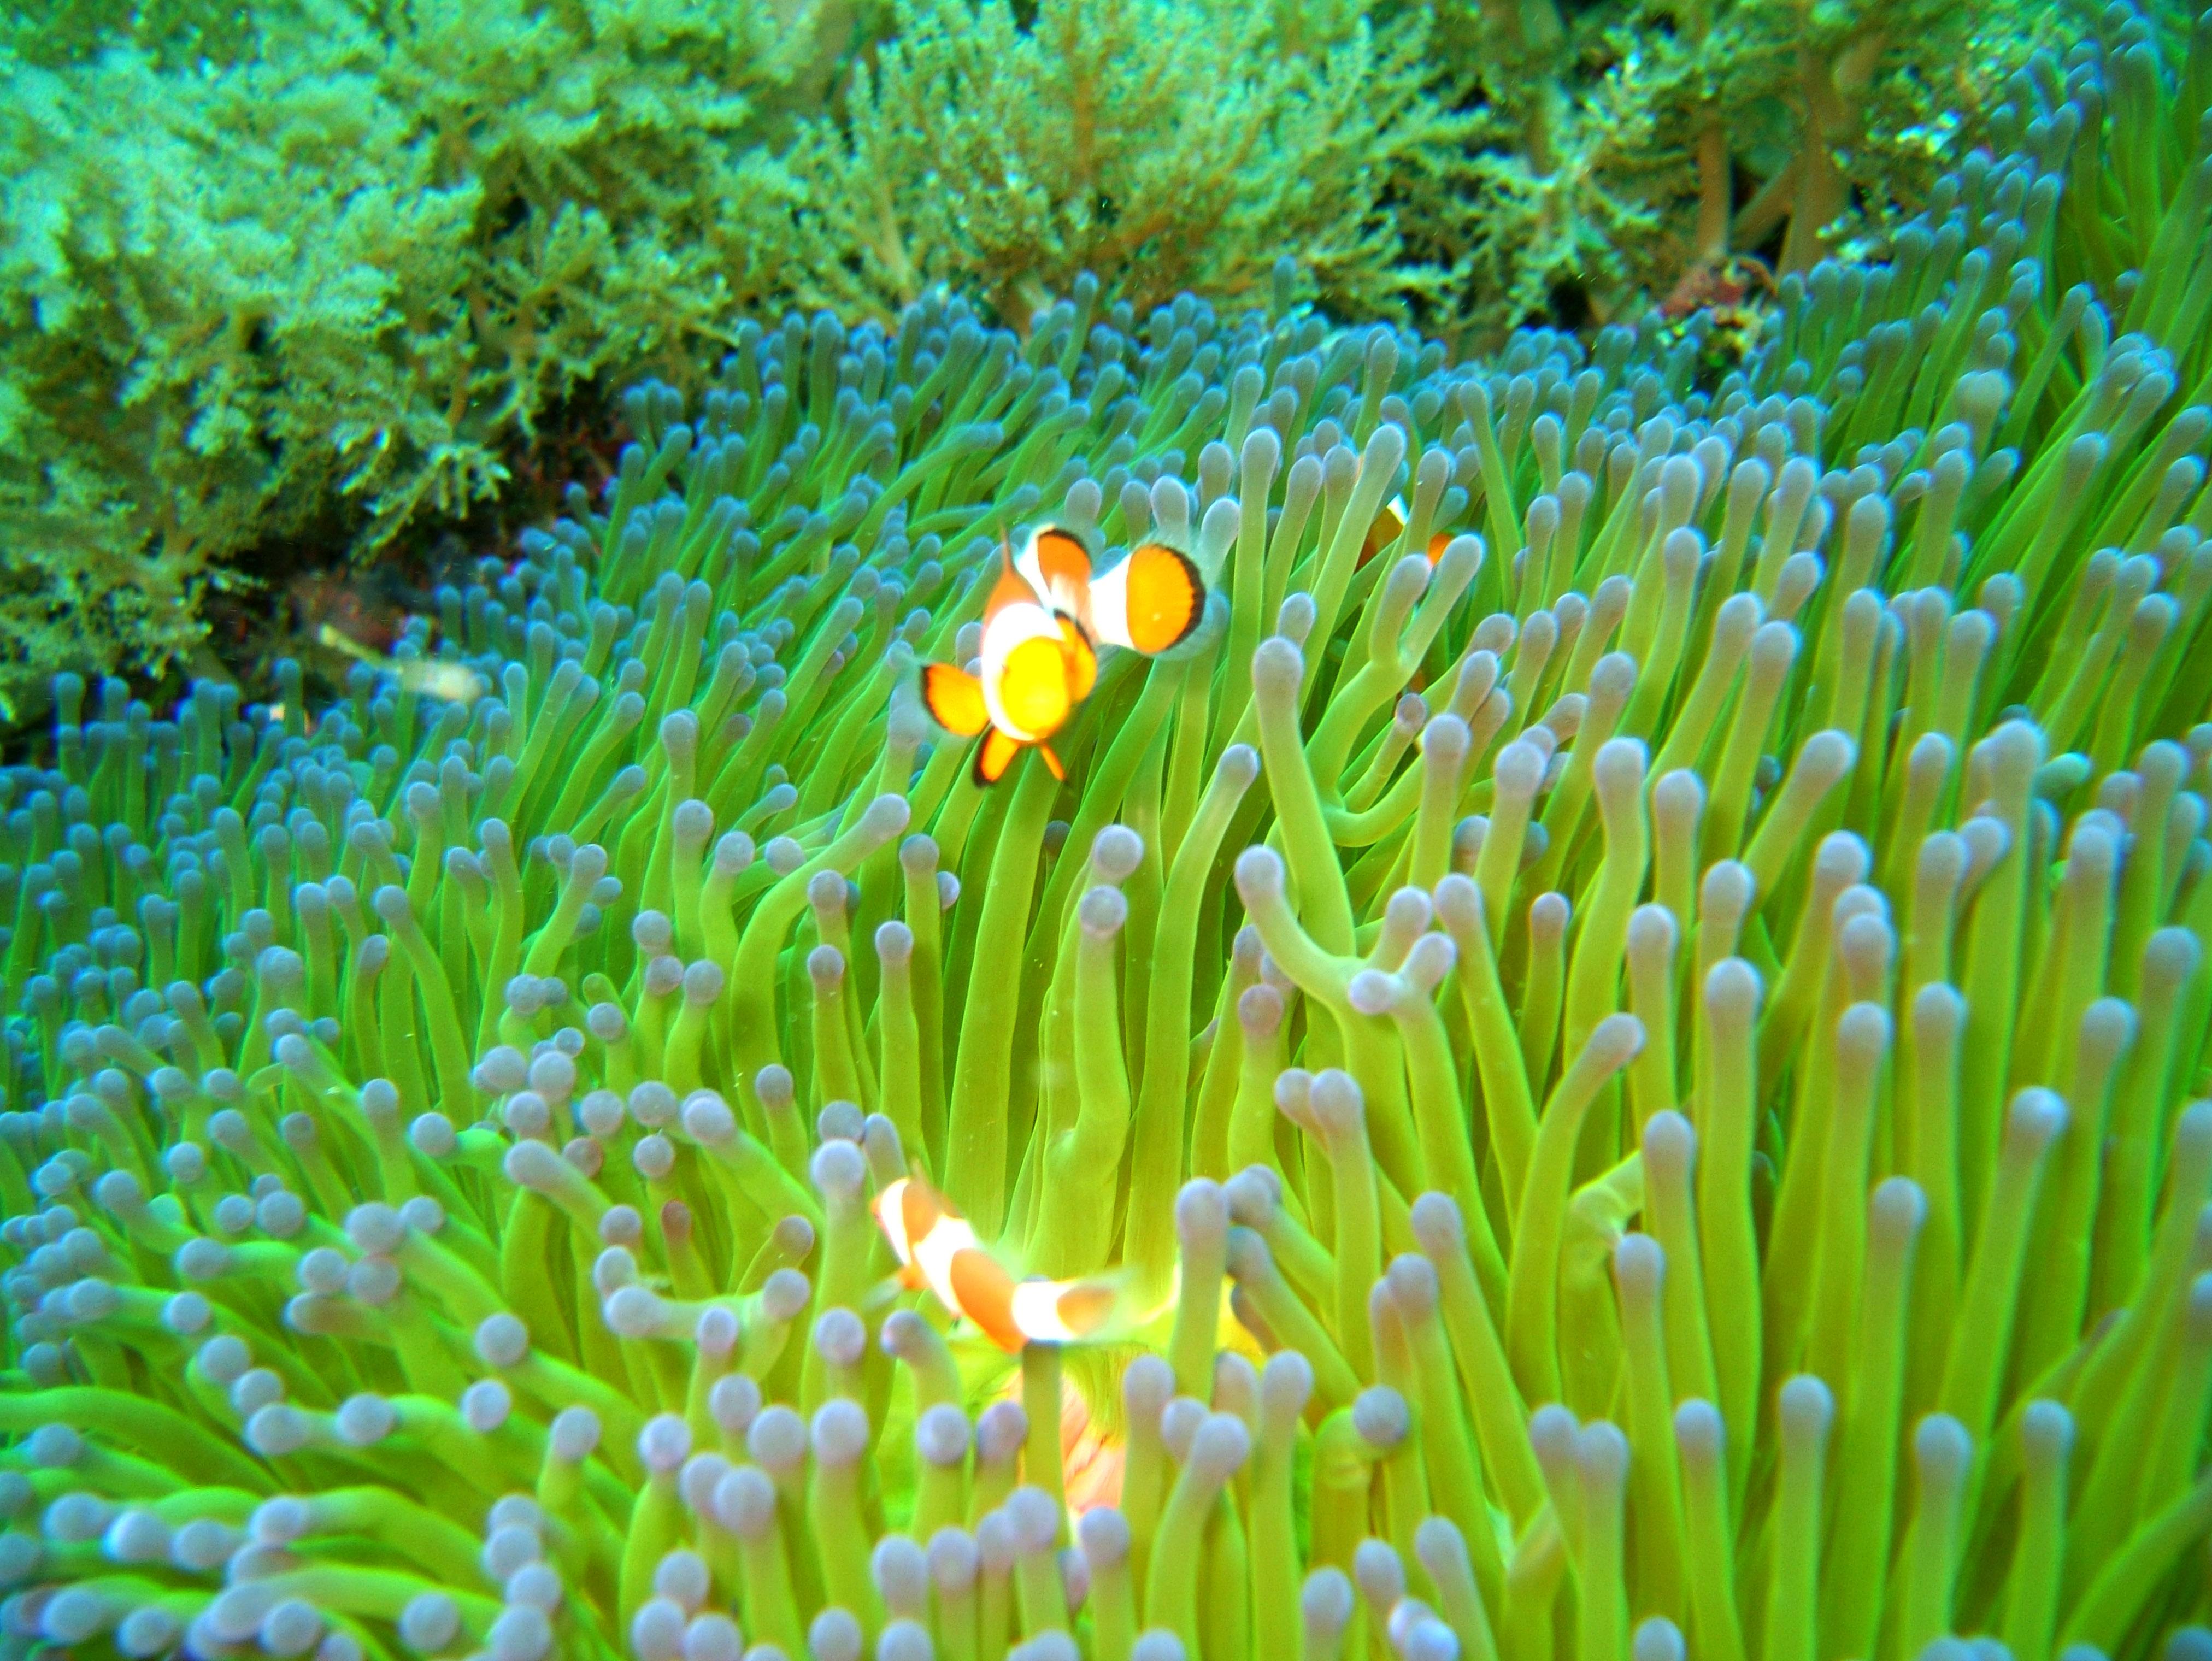 Philippines Cebu Bohol Balicasag Island Black Forest dive Dec 2005 19